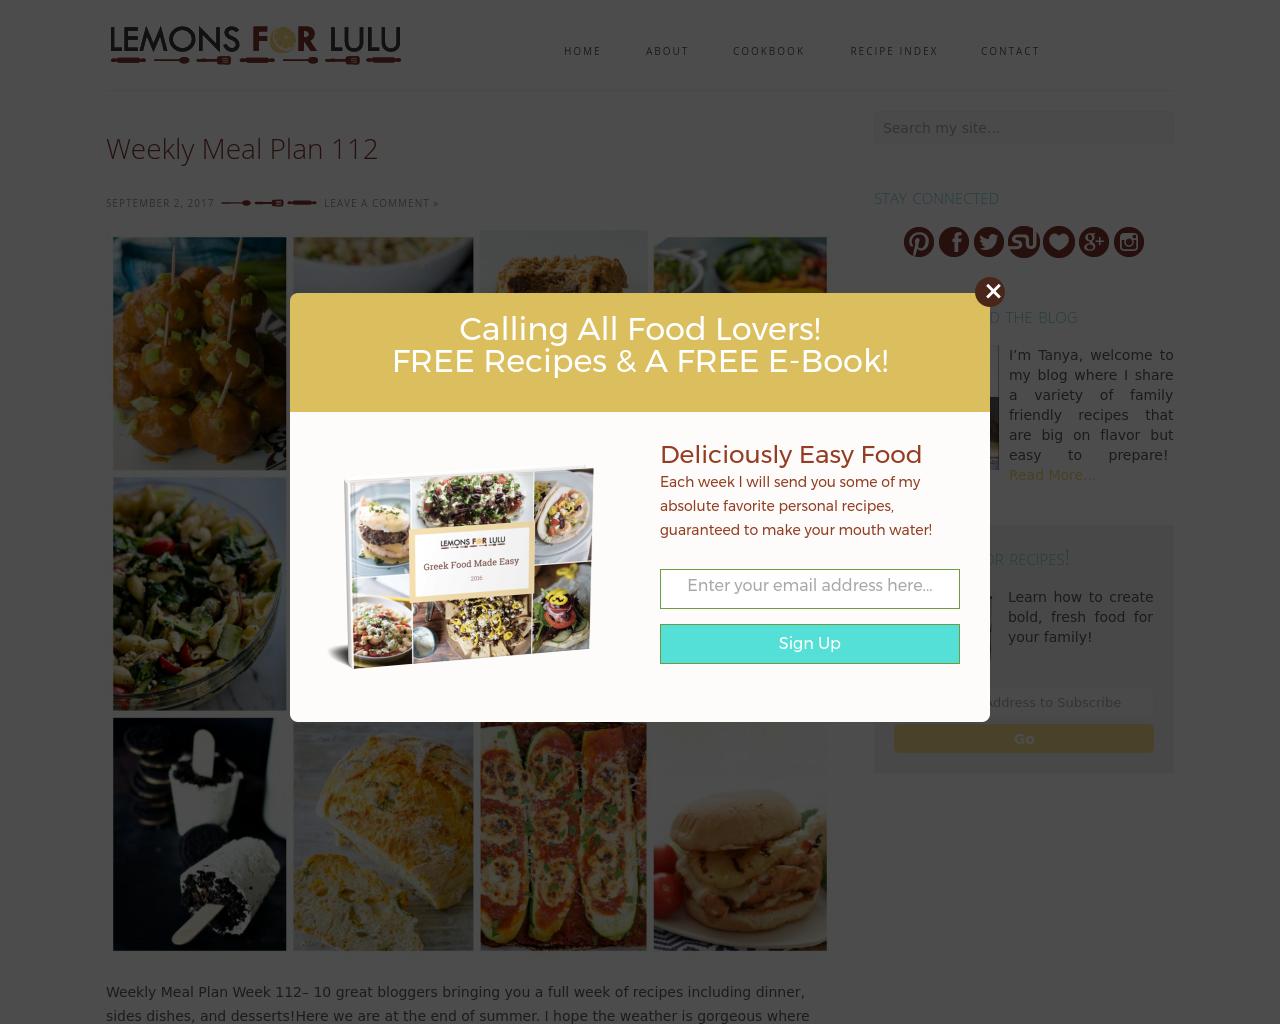 Lemons-For-Lulu-Advertising-Reviews-Pricing